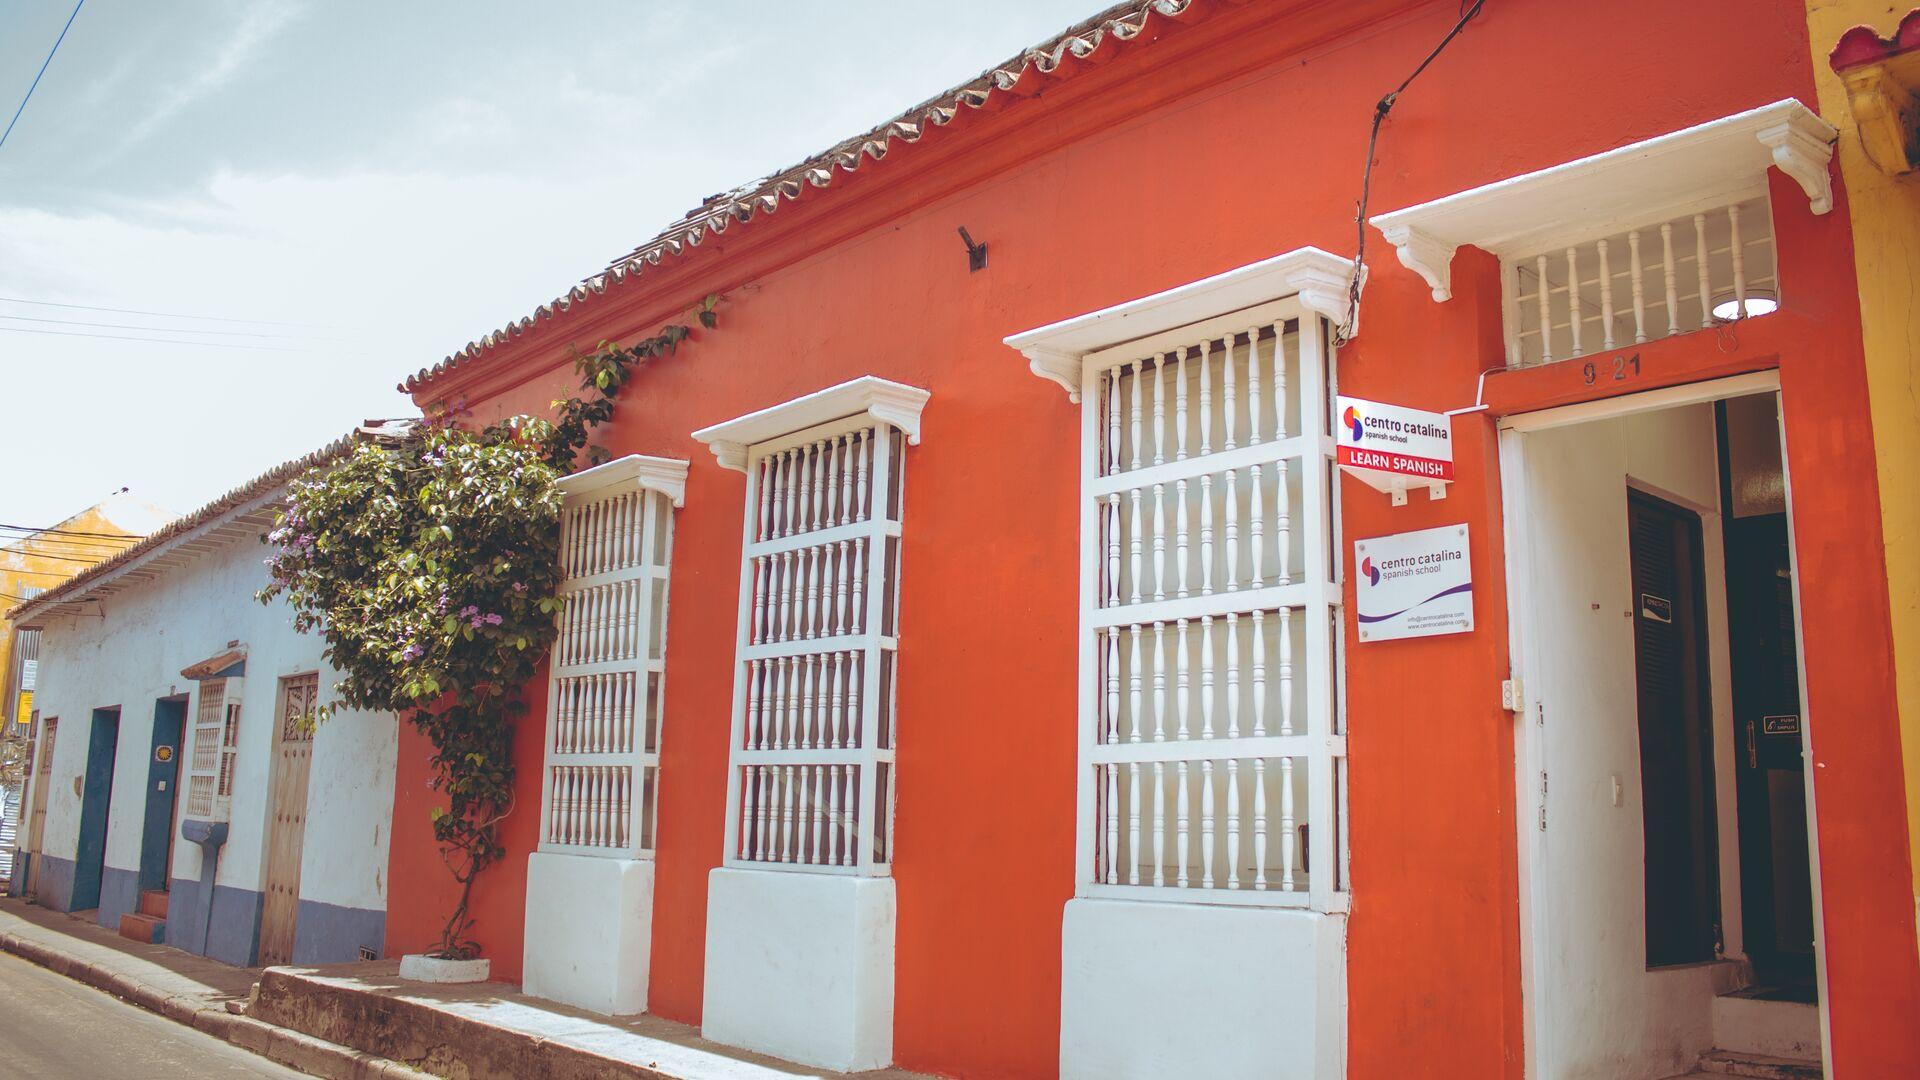 Séjour linguistique Colombie, Cartagena - Centro Catalina Cartagena - École